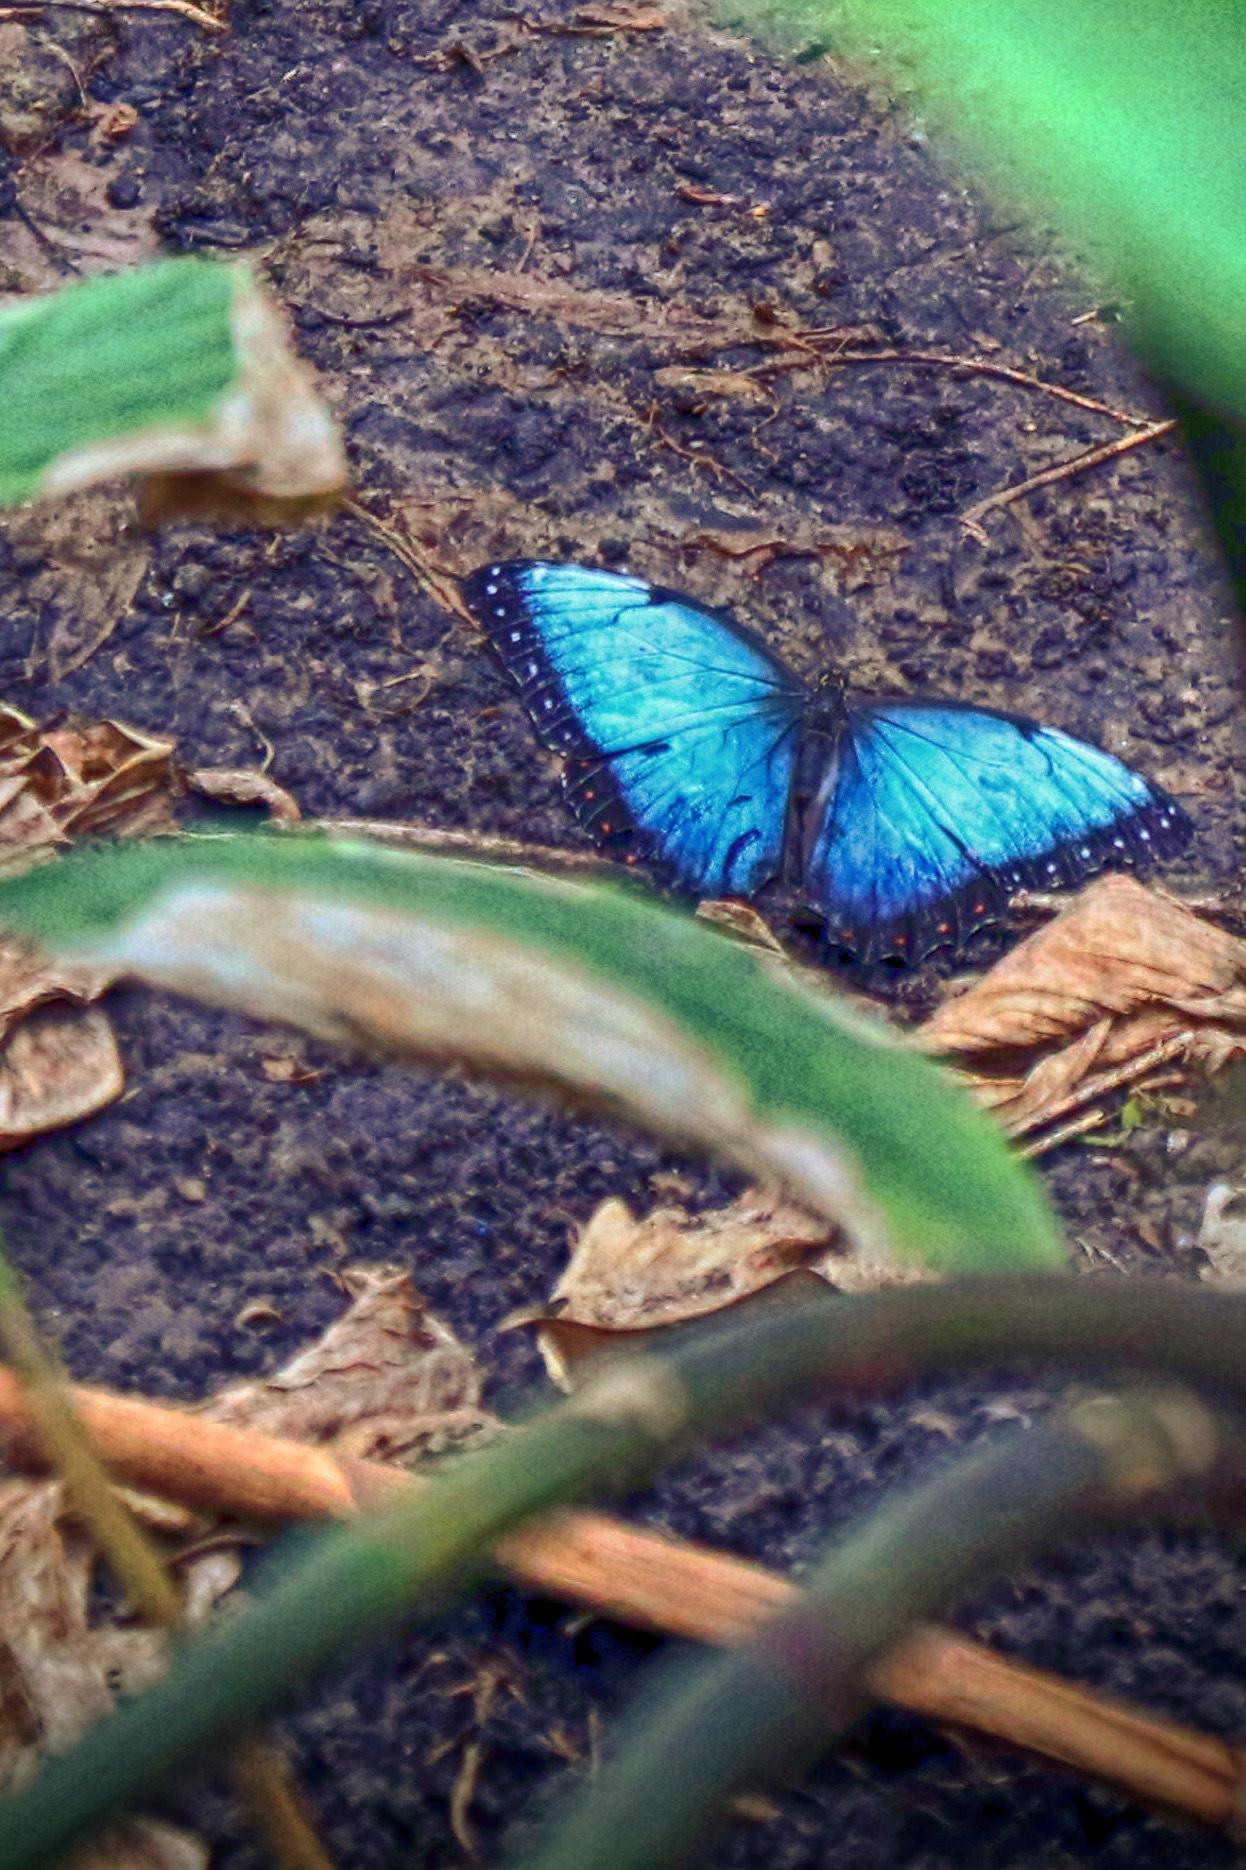 Blue by jblakephotos